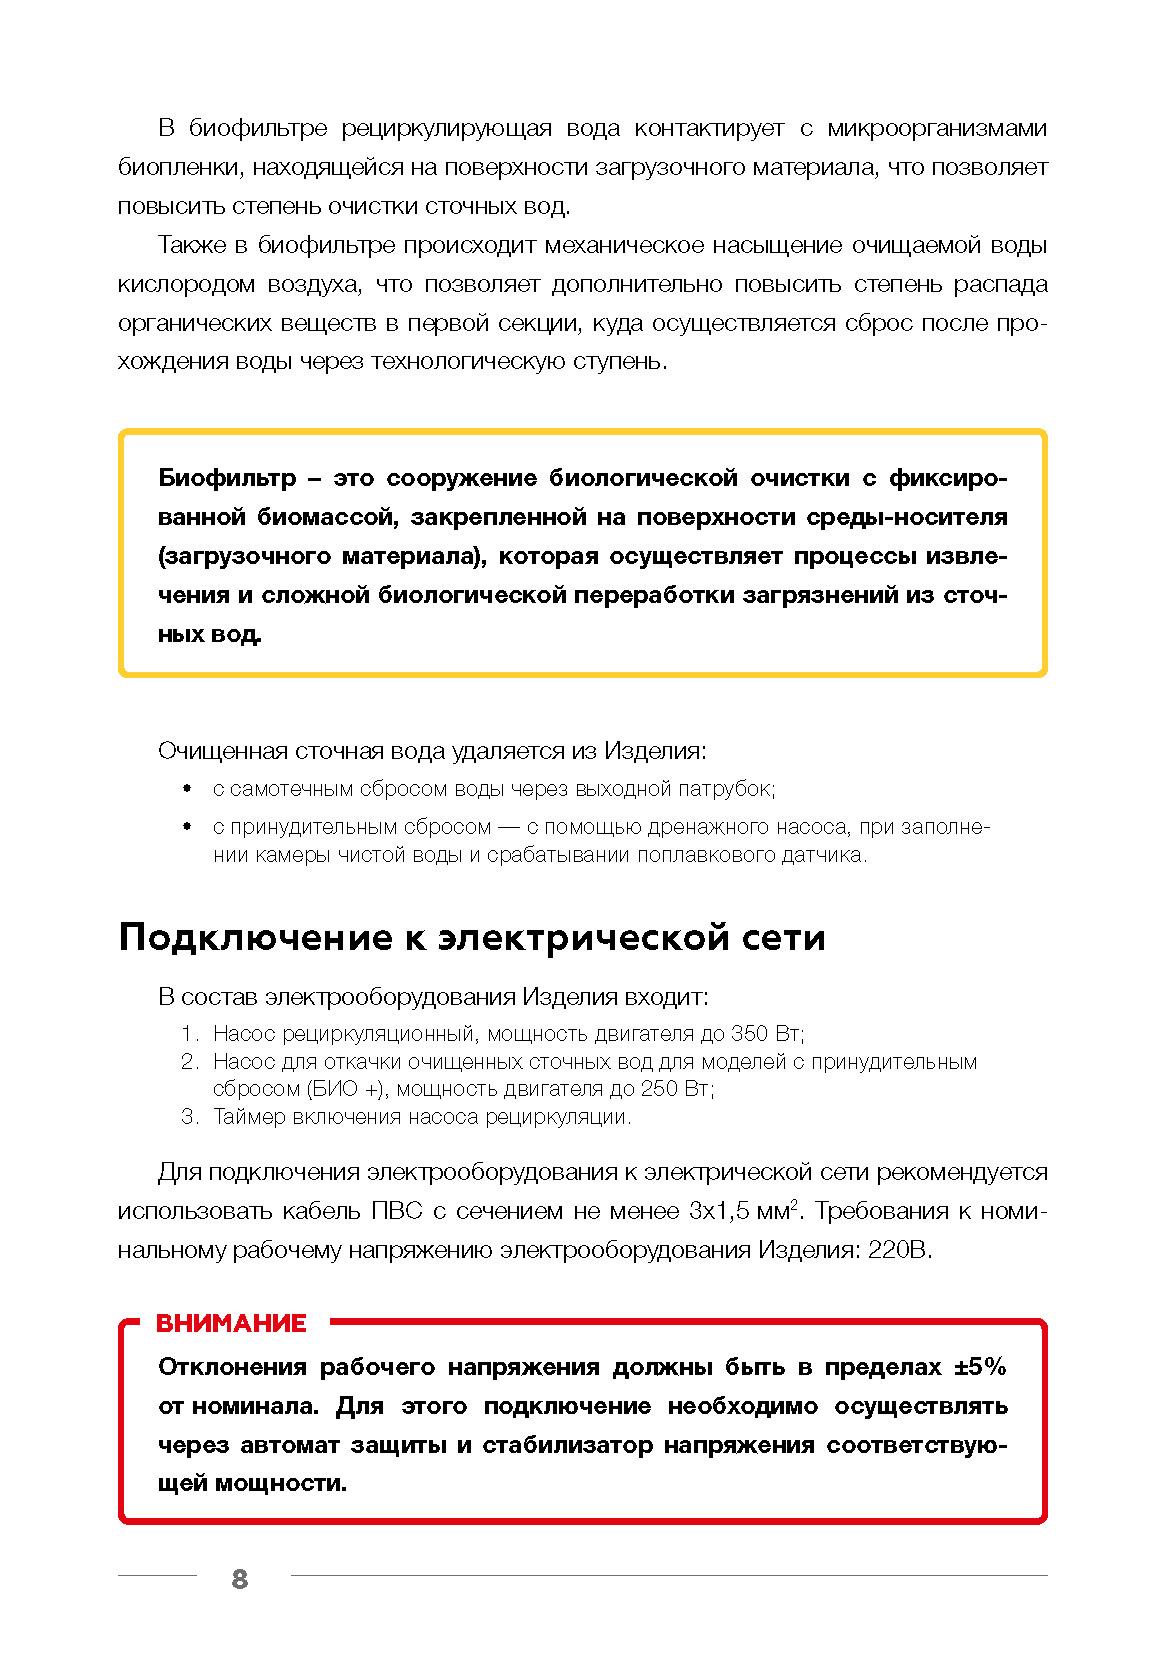 Технический паспорт Евролос Био_Страница_10